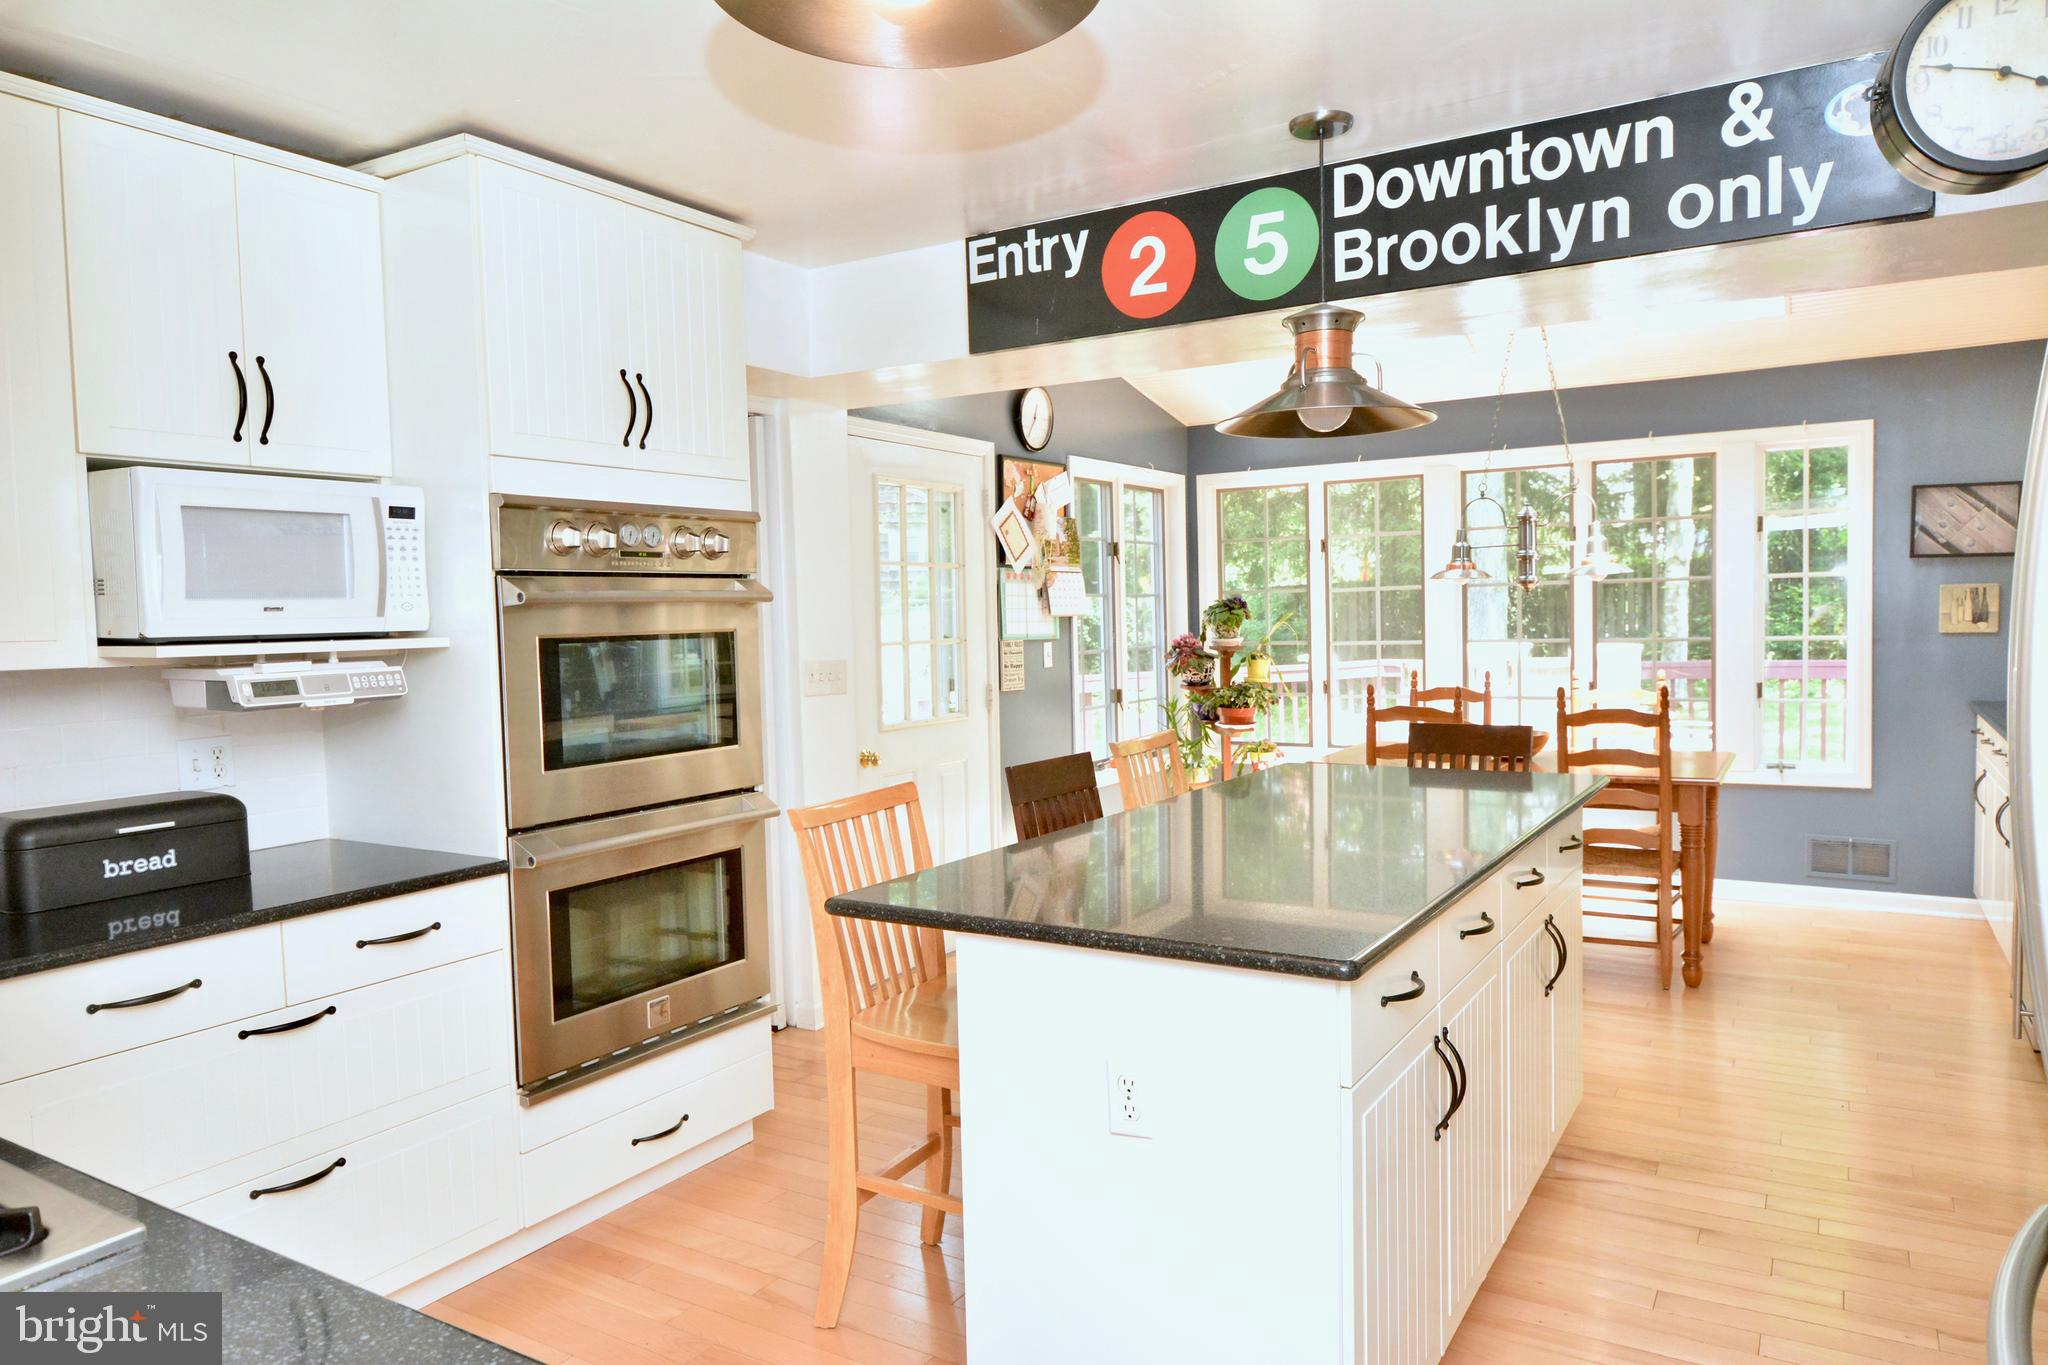 Center island kitchen with breakfast room